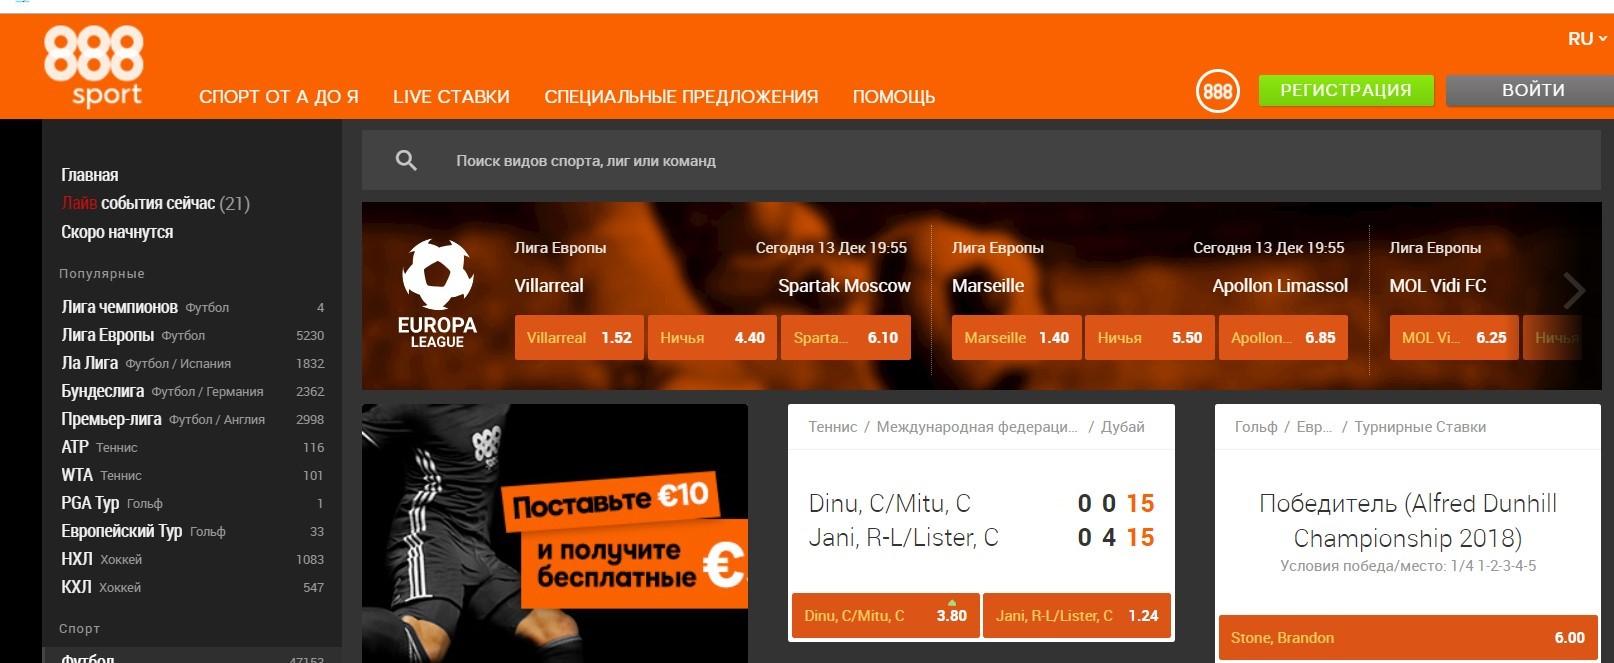 888 спорт. Главная страница сайта